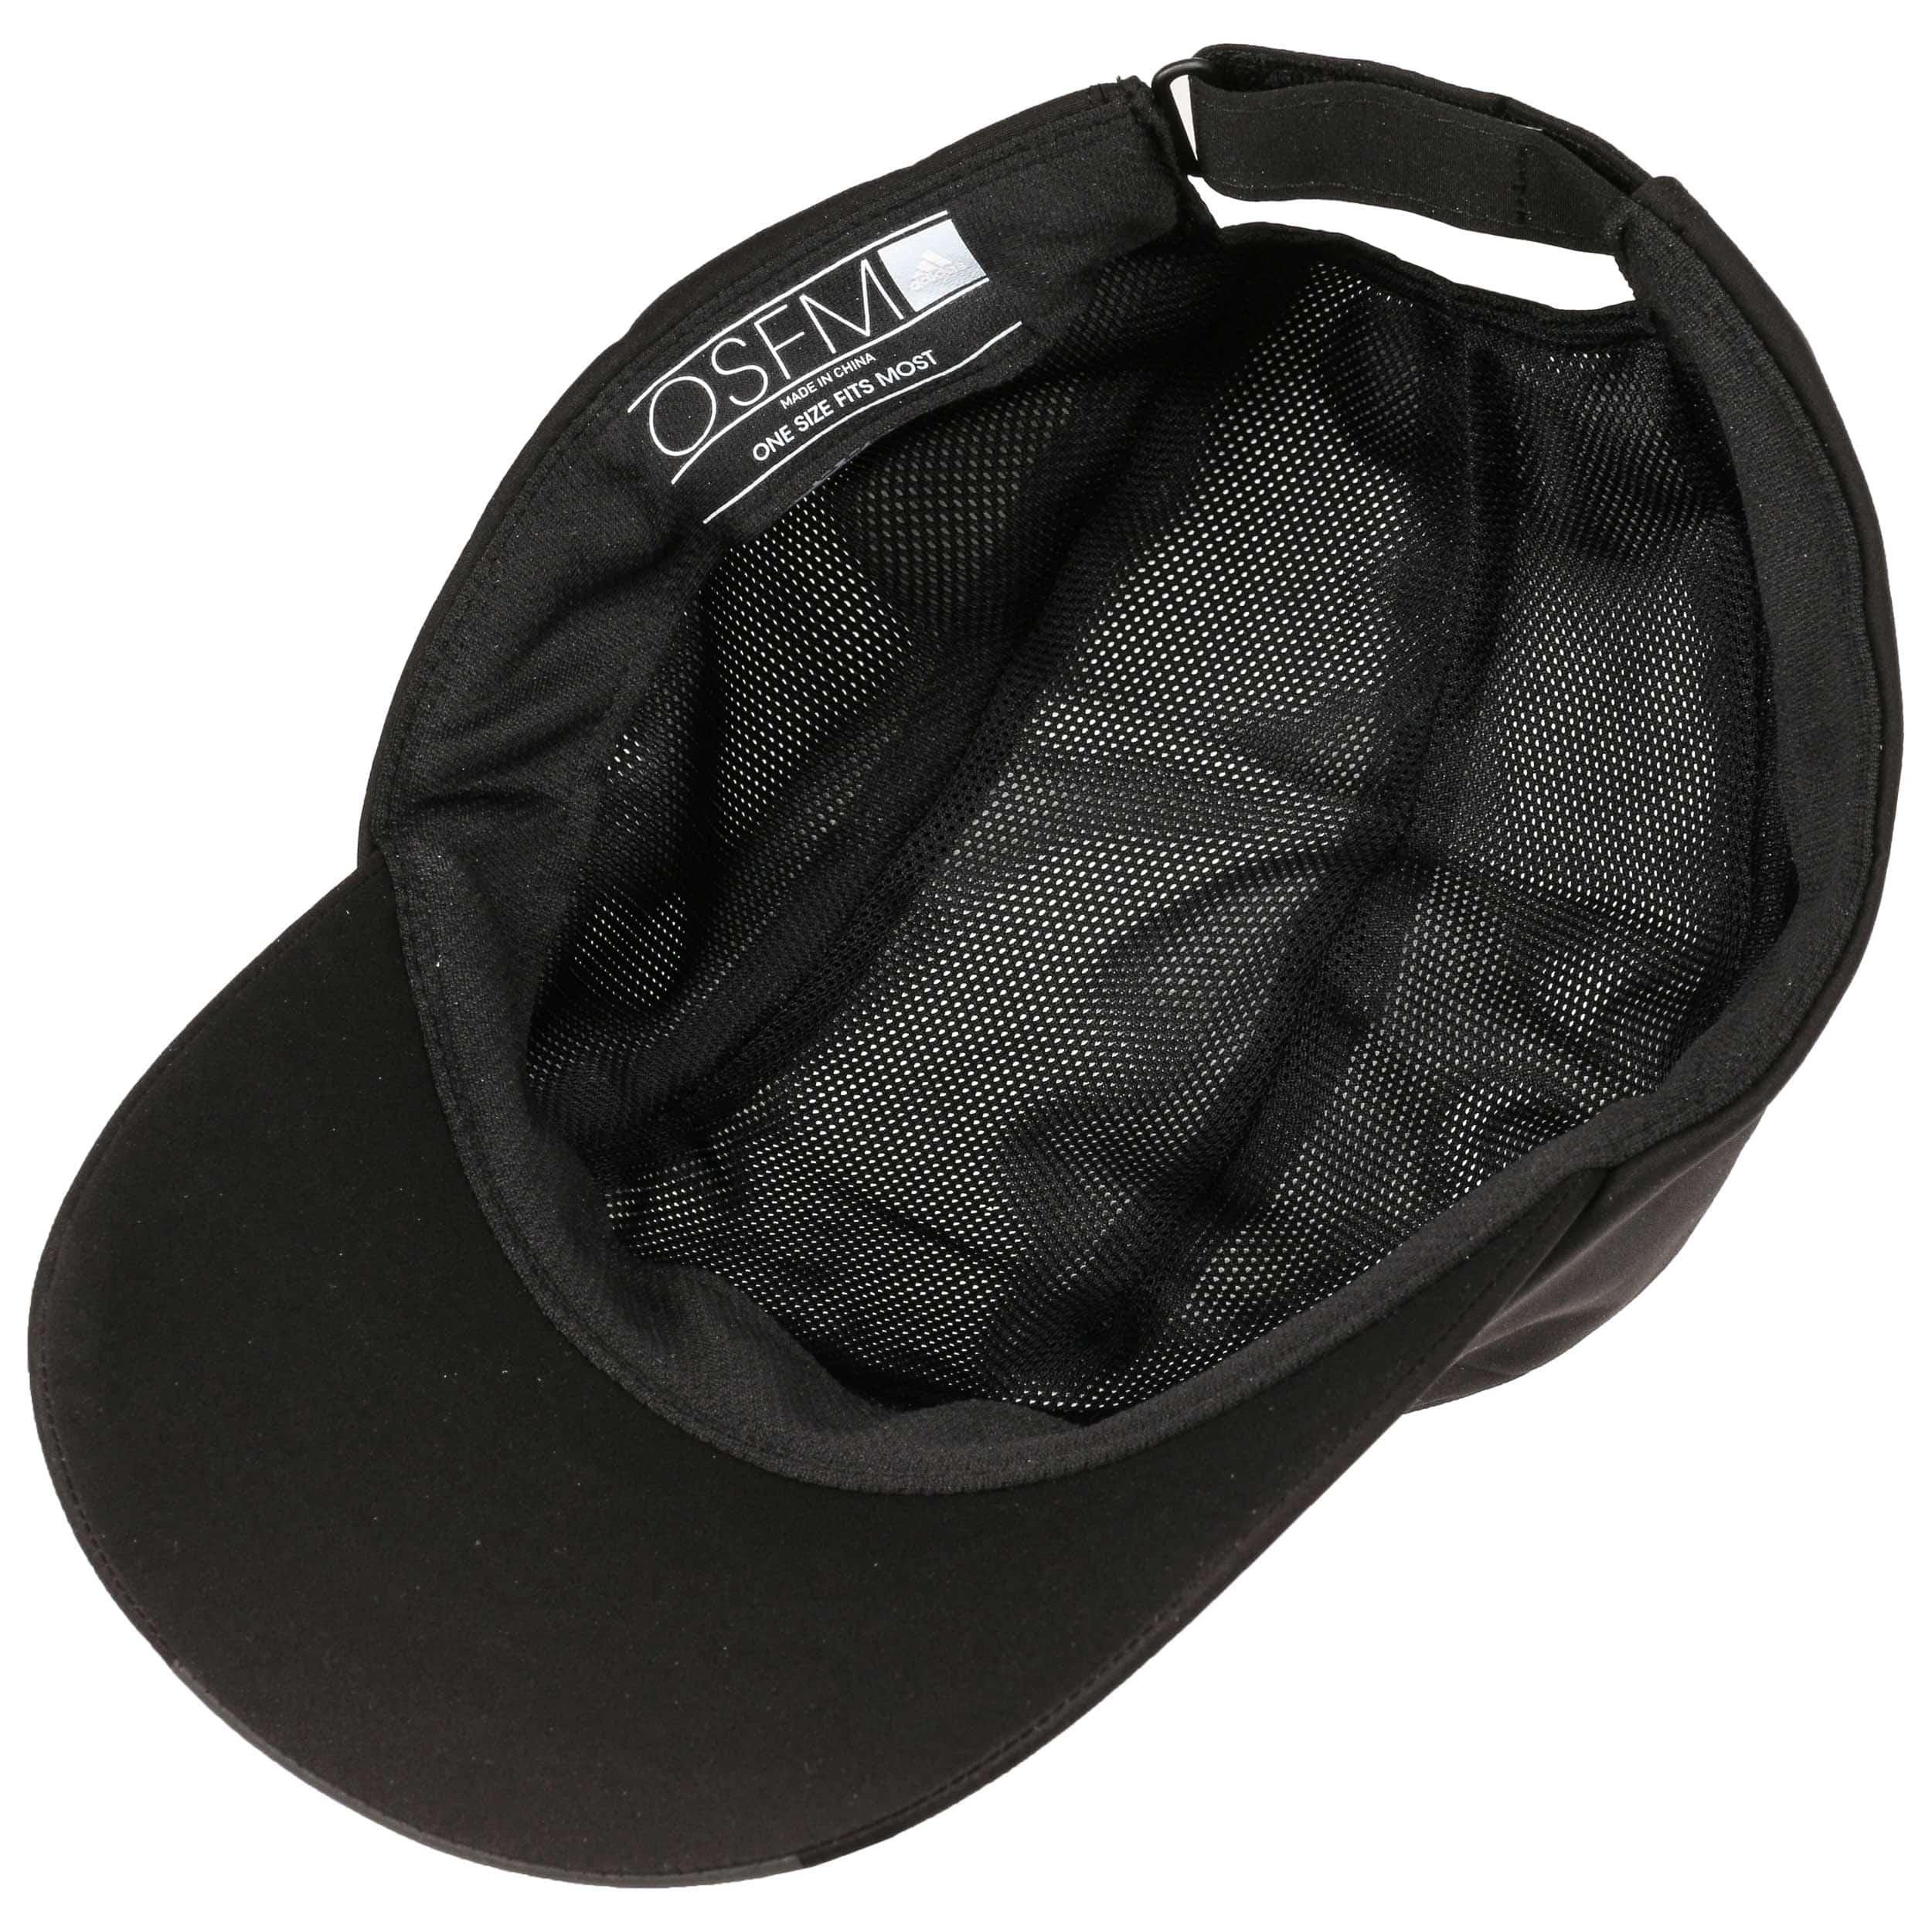 5b7df6d4bad281 ... Climaproof Running Strapback Cap by adidas - black 2 ...